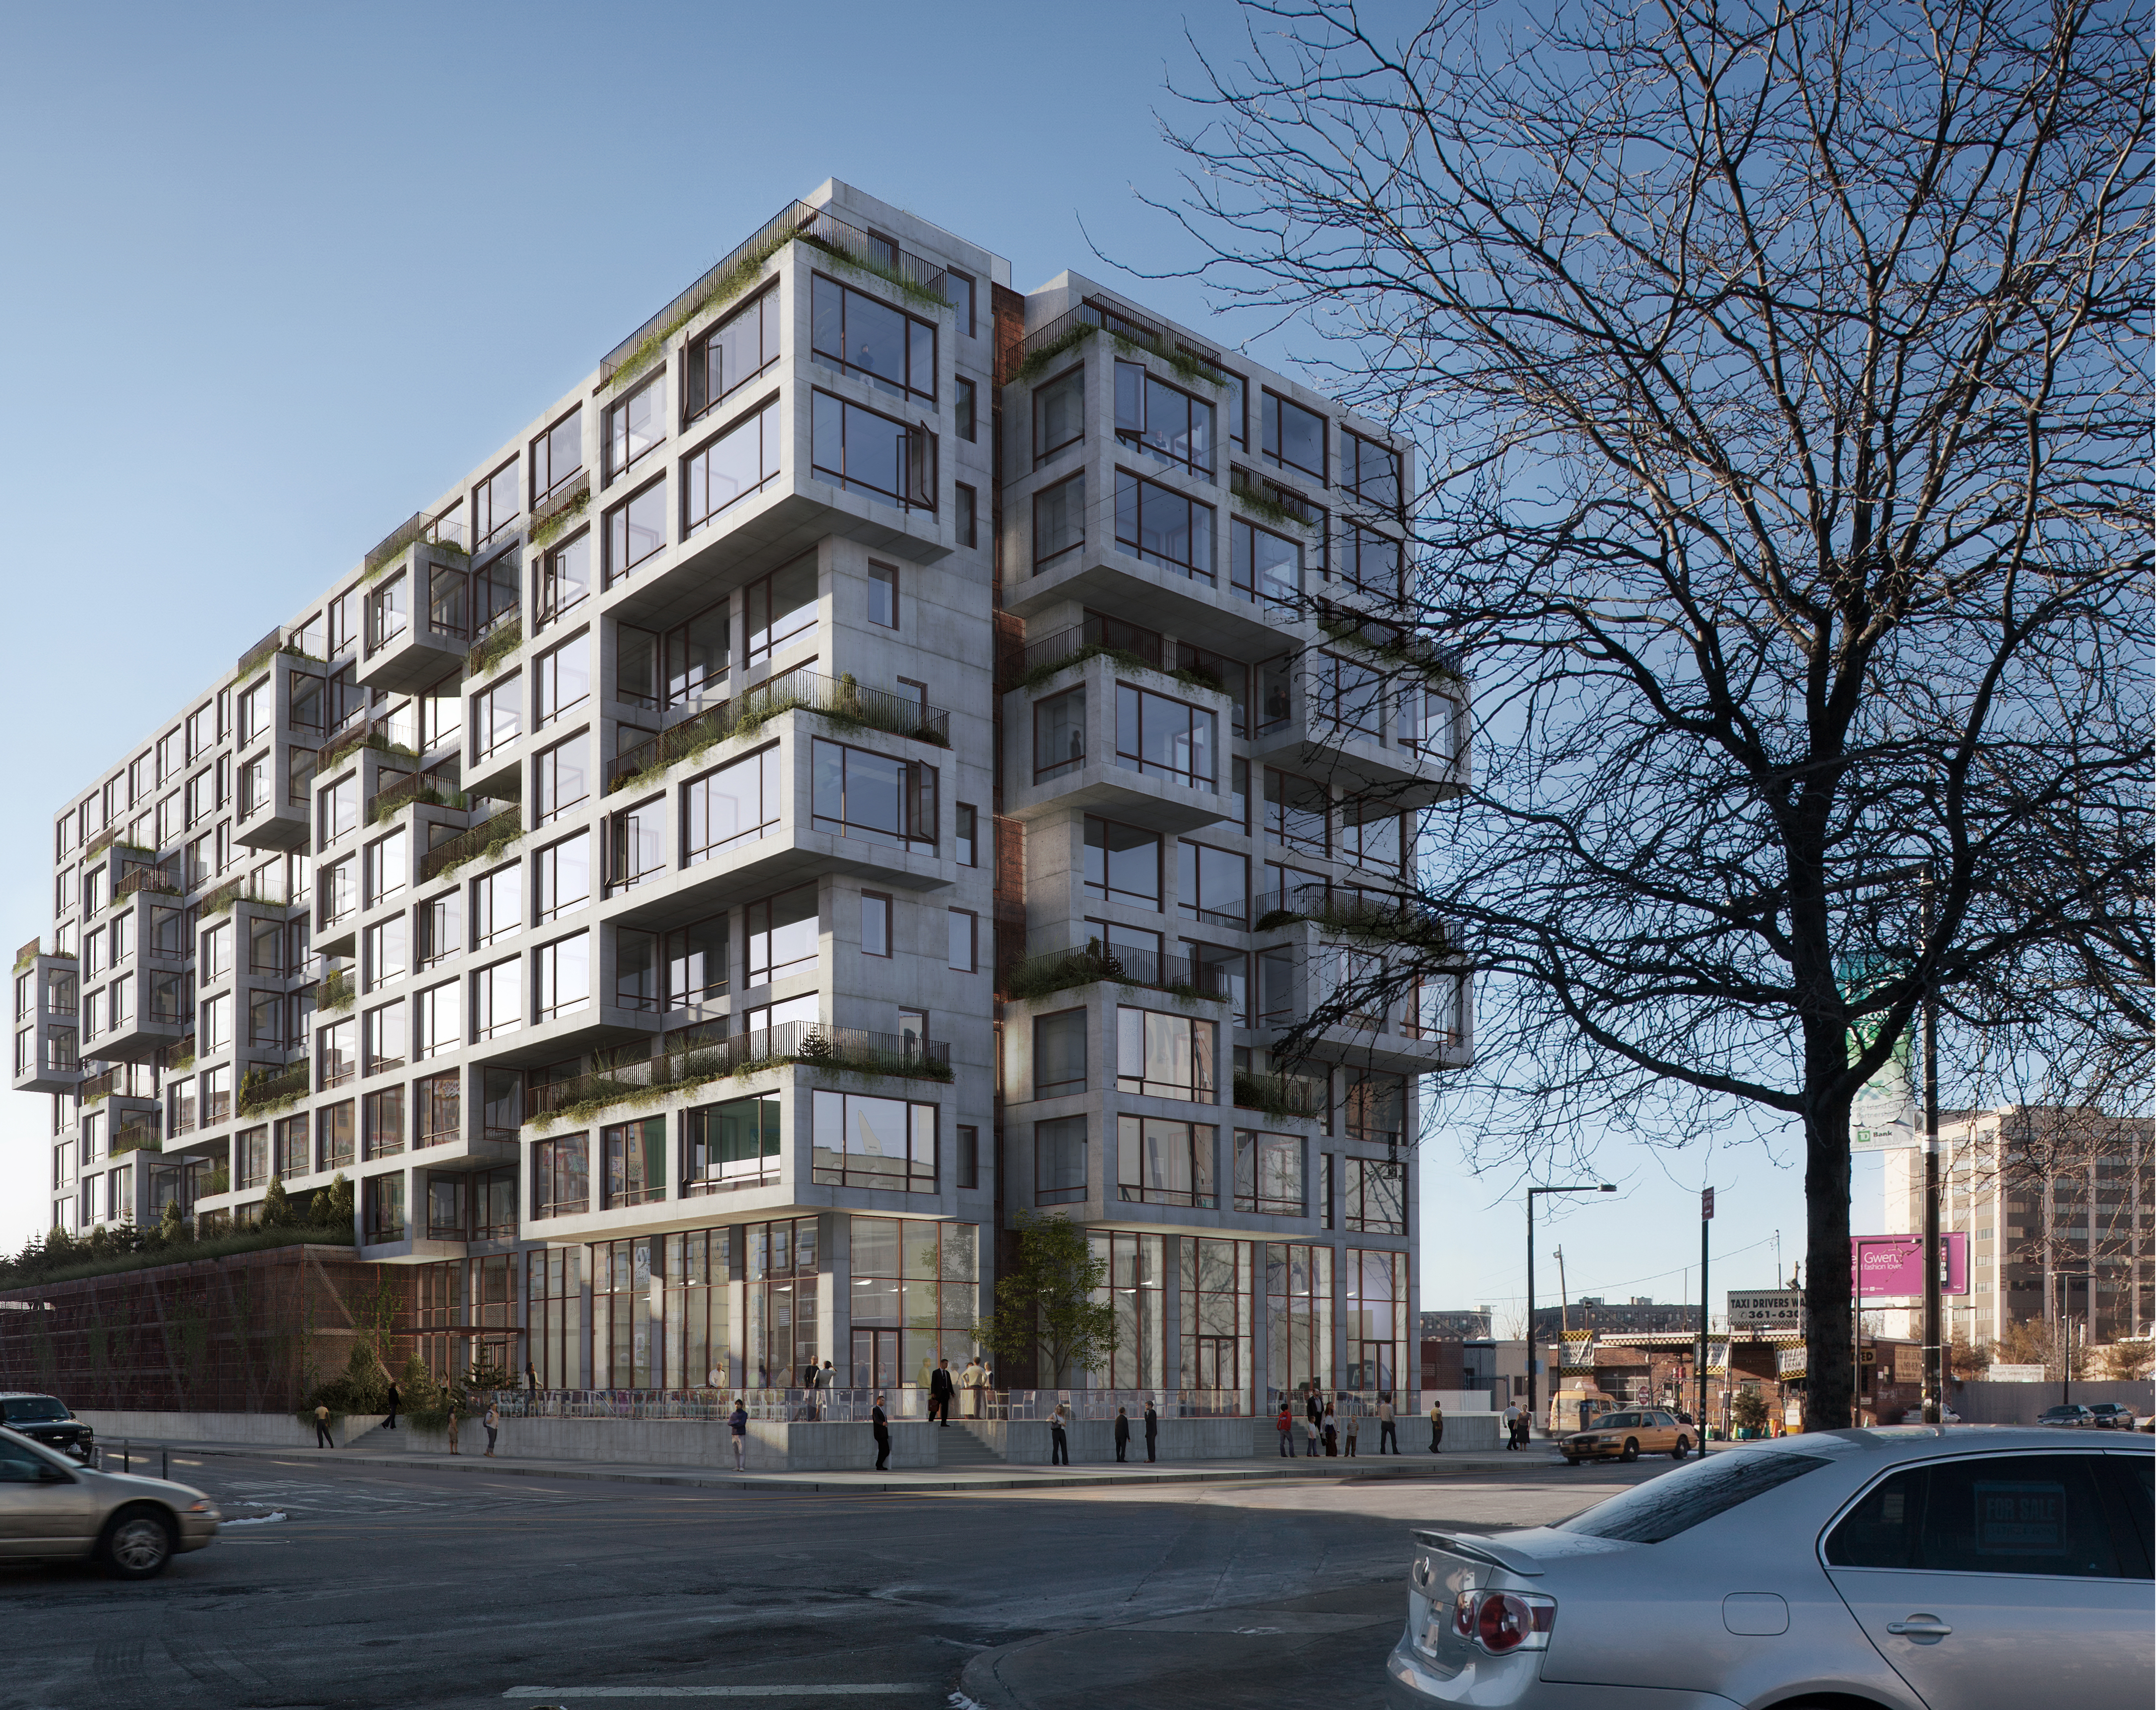 NEW DEVELOPMENT: LIC rental 60 percent leased, Closings ...